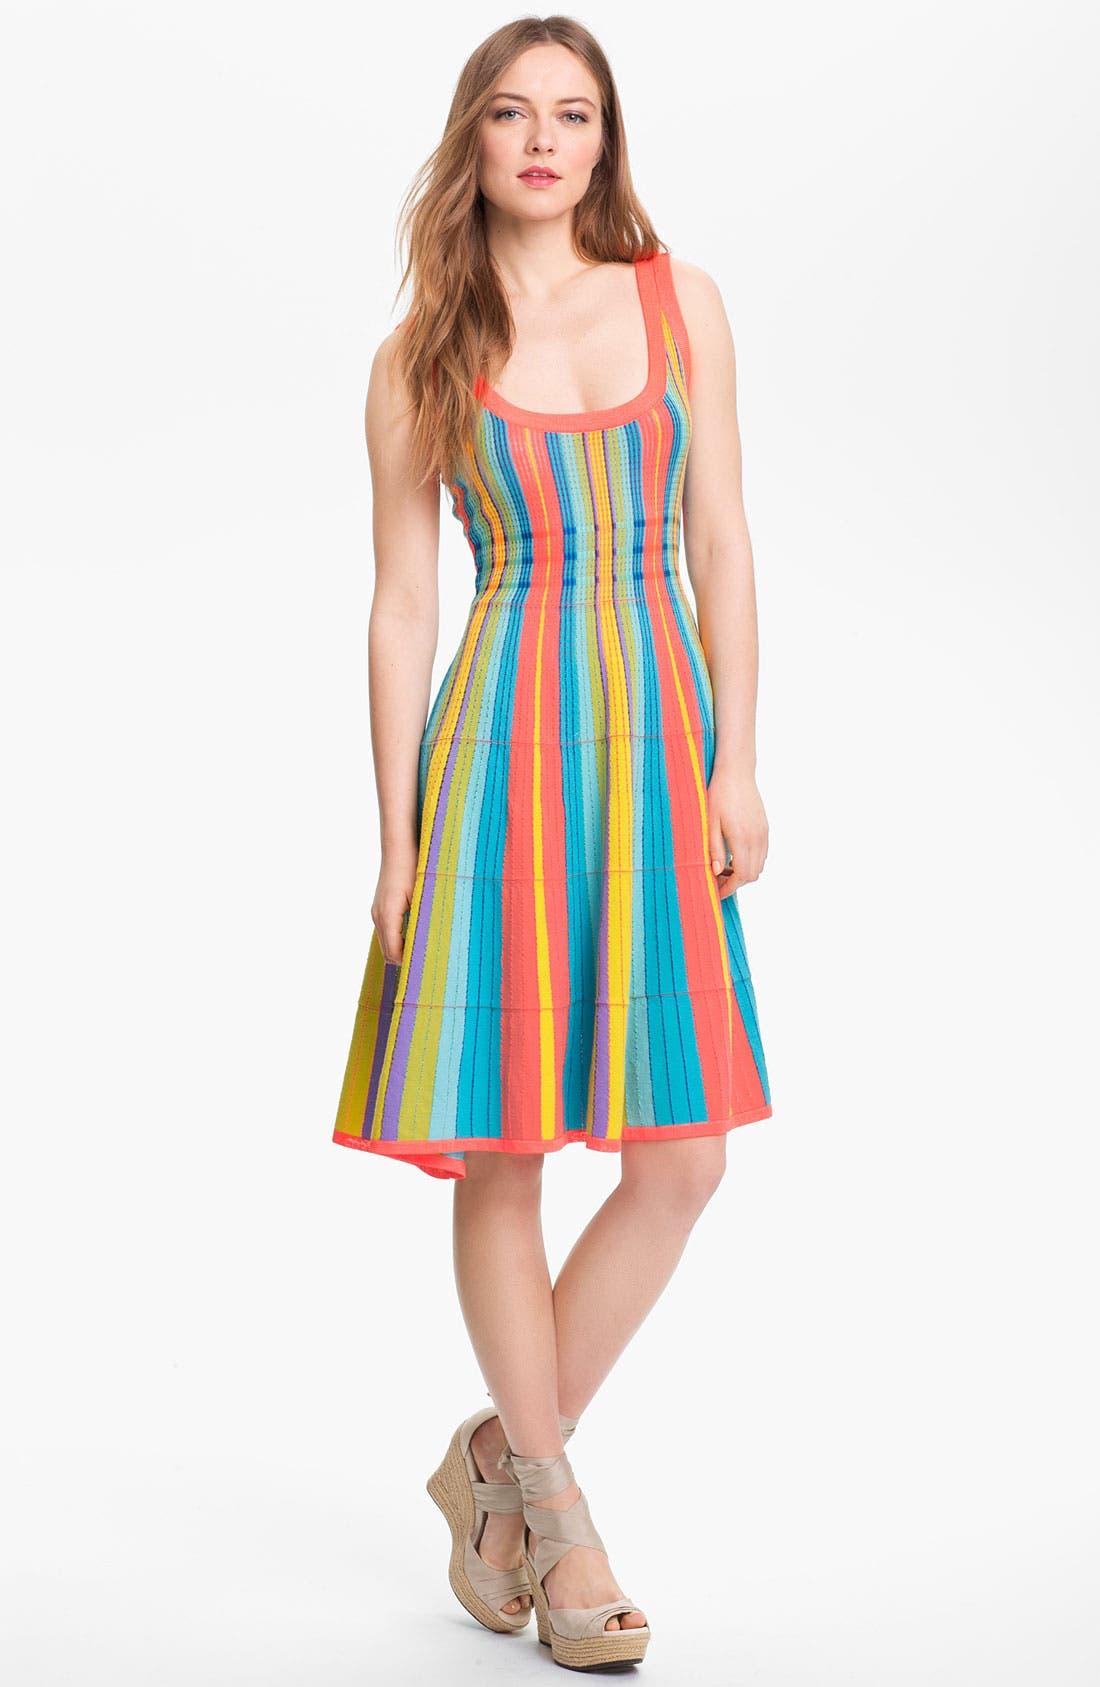 Main Image - kate spade new york 'ariele' cotton blend a-line dress